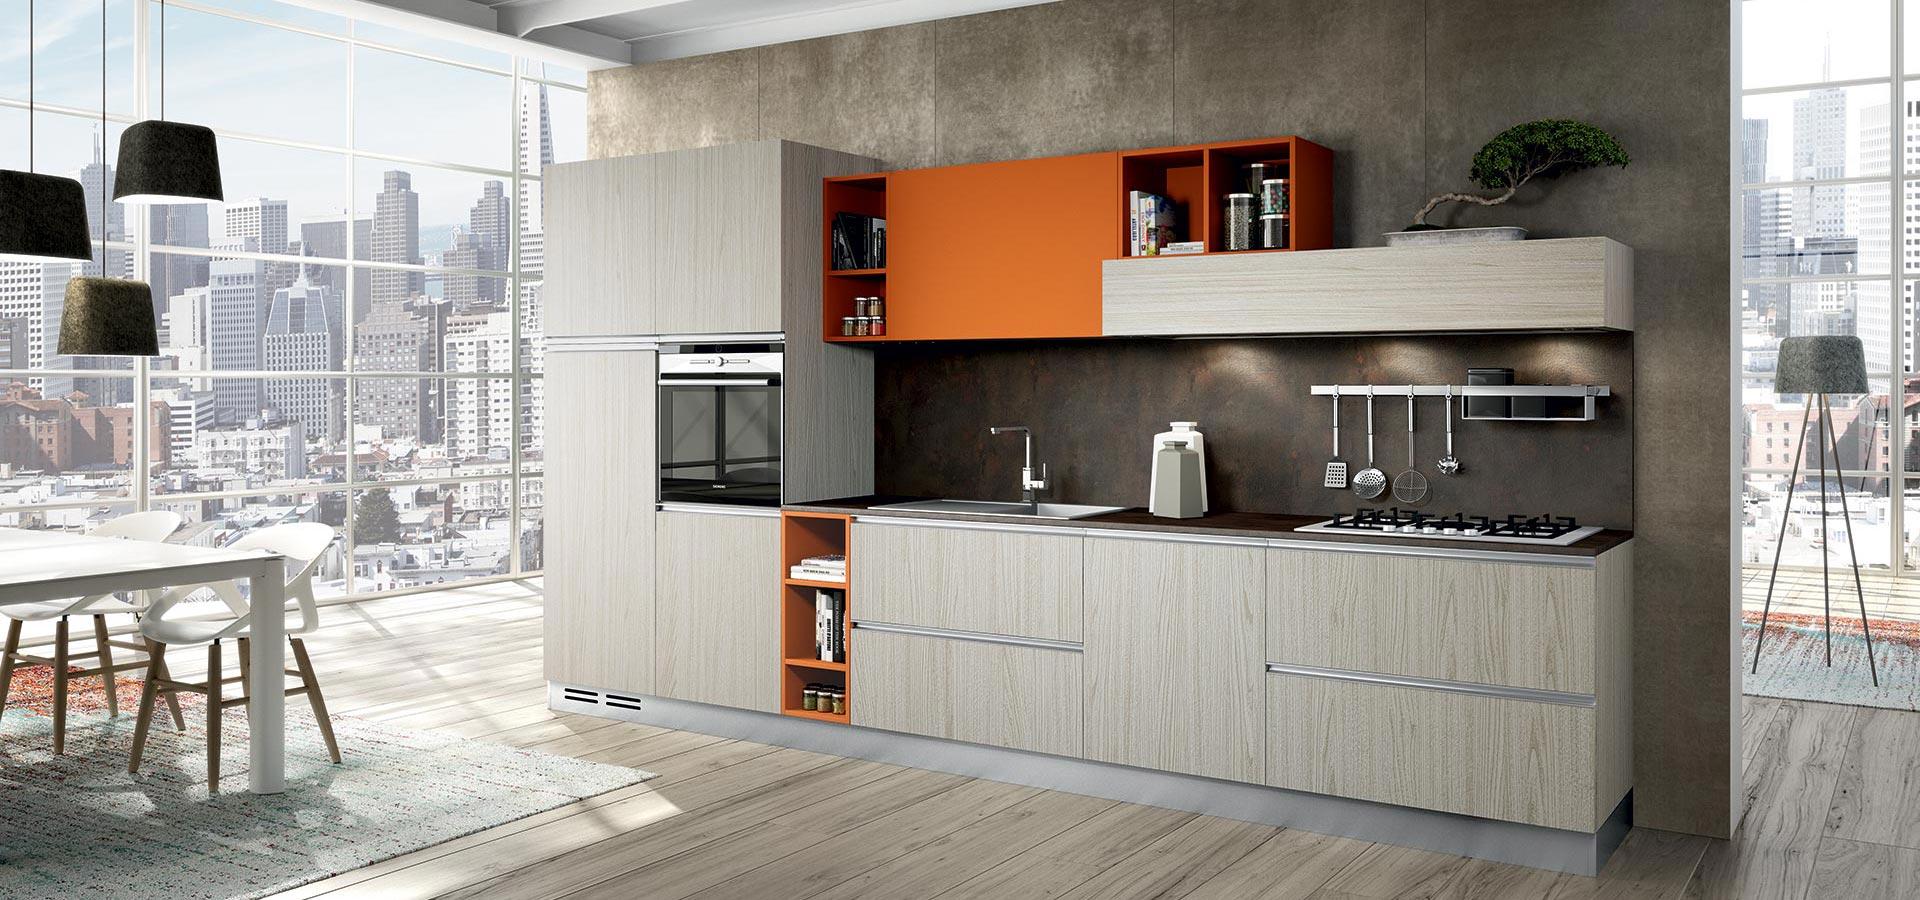 In cucina diamo spazio al colore casa di stile - Top cucina moderna ...